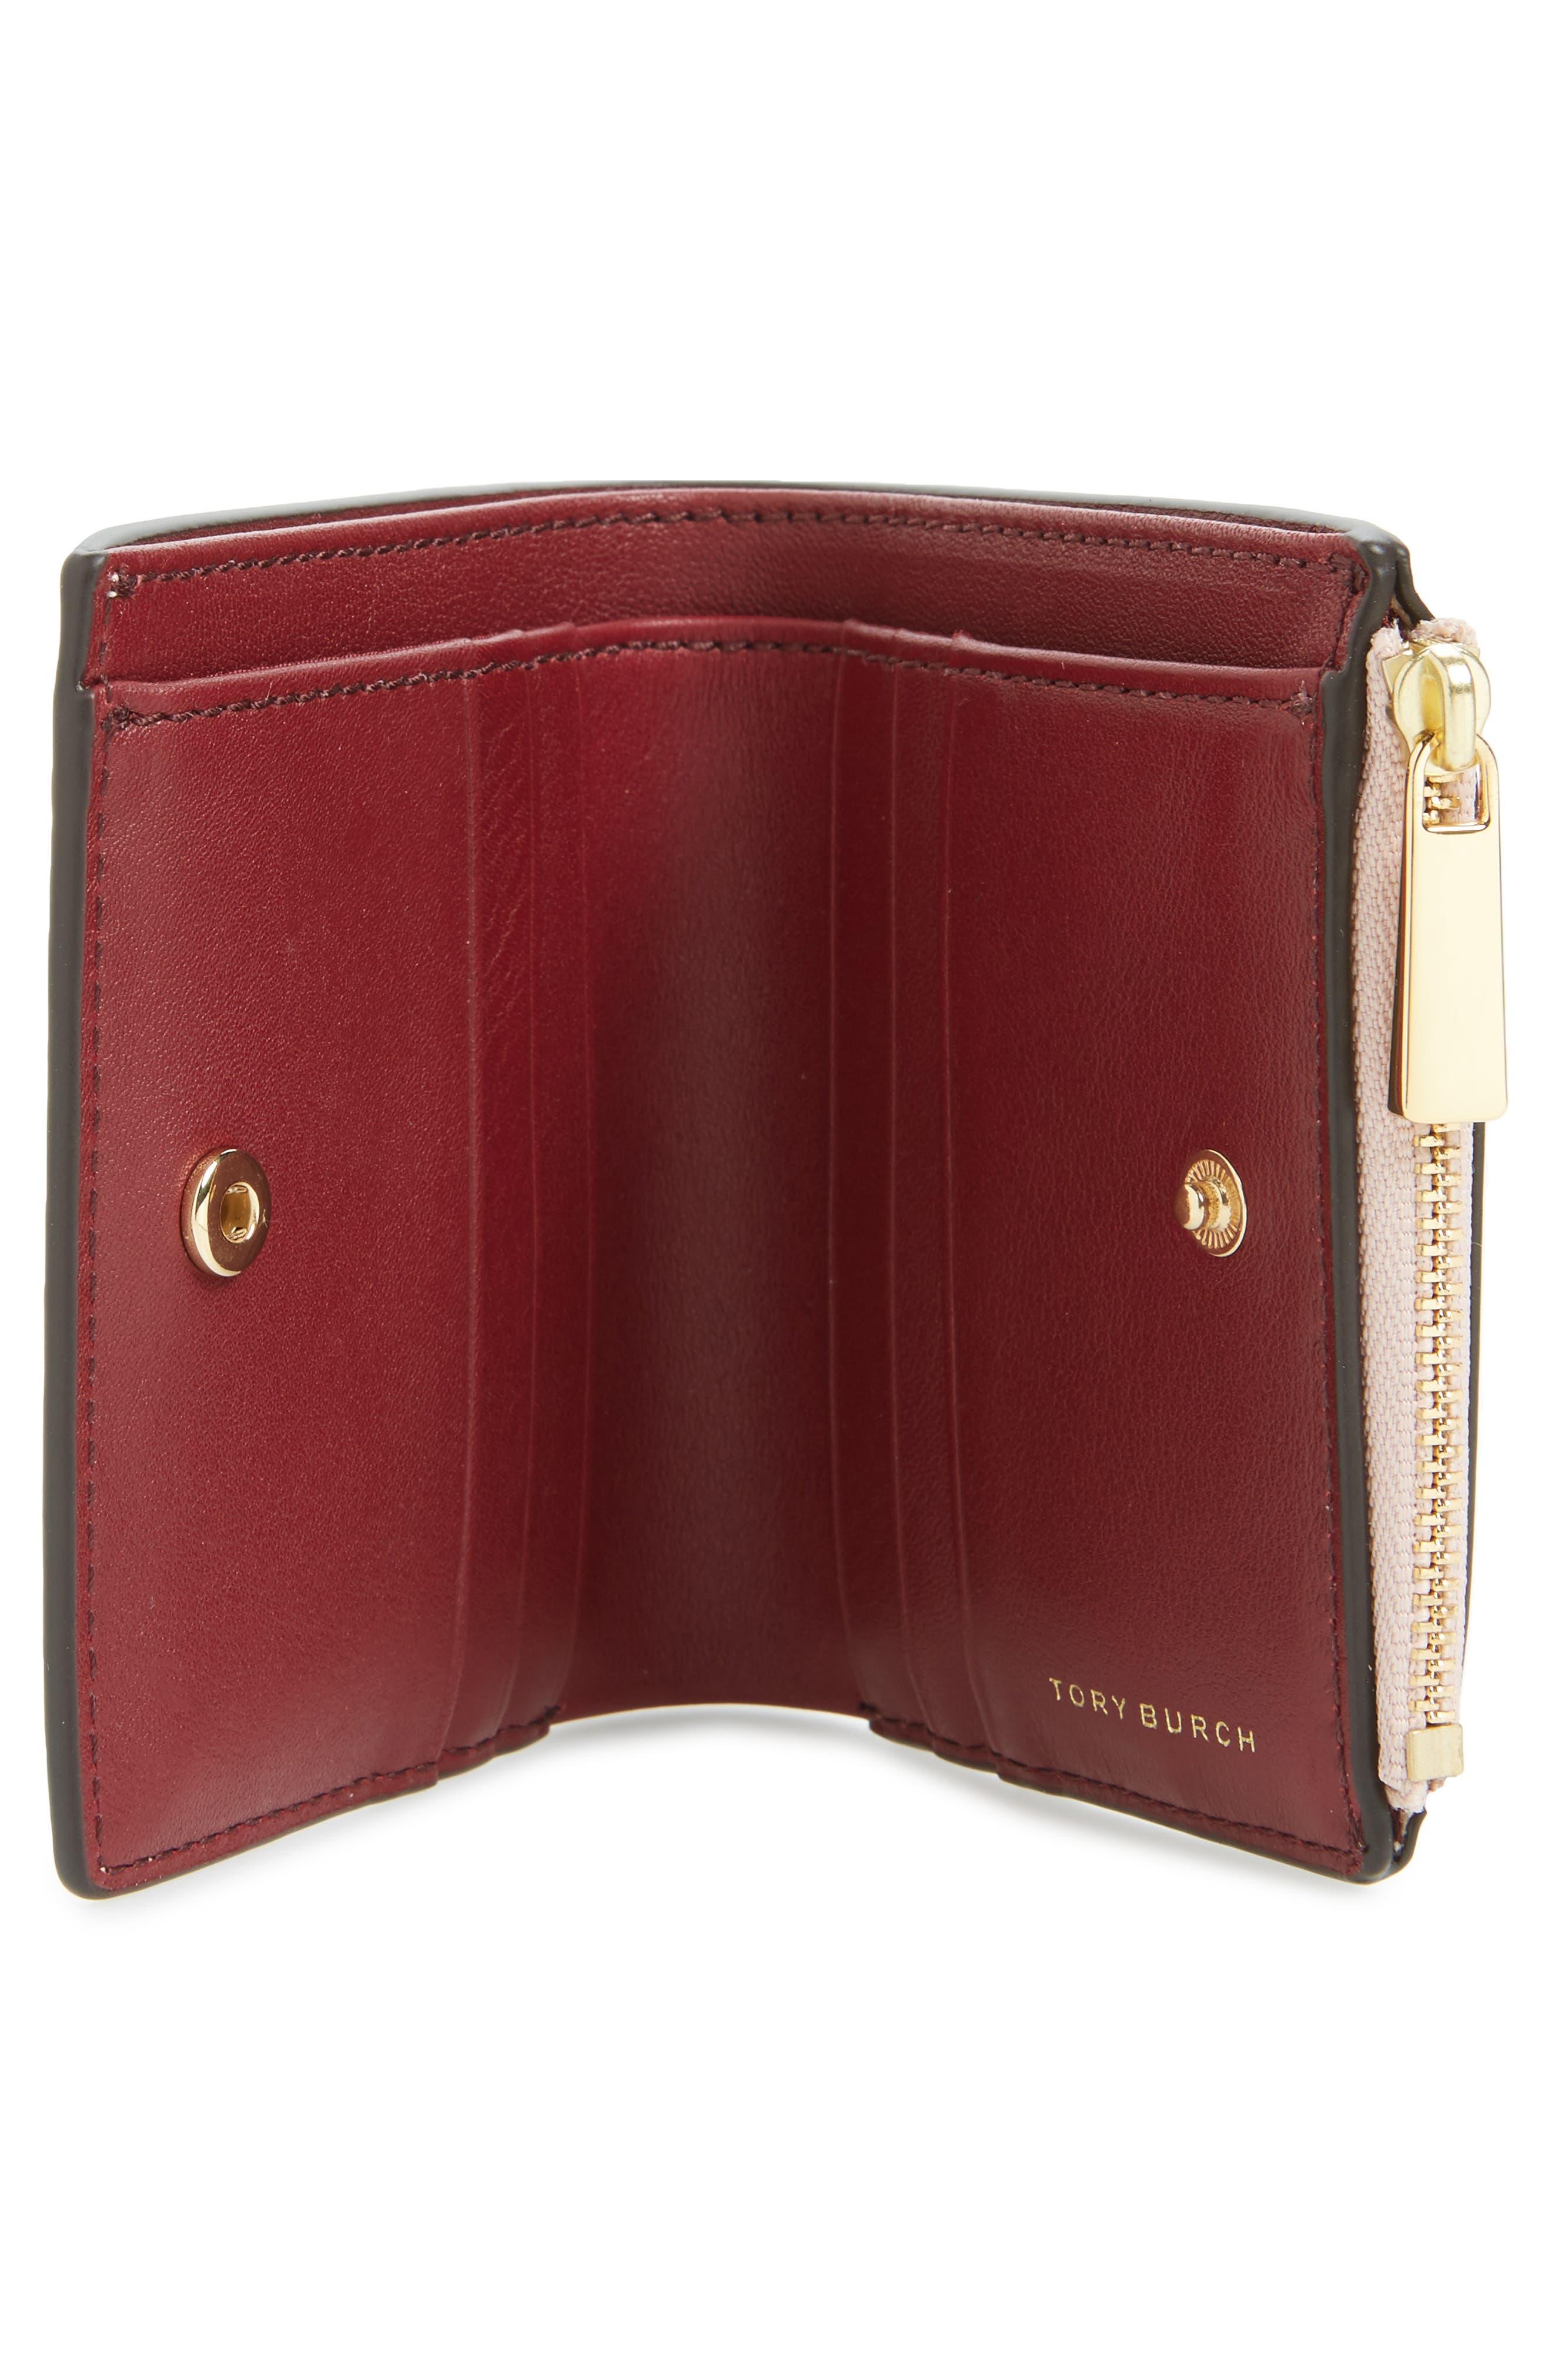 Mini Robinson Wallet Patent Leather Bifold Wallet,                             Alternate thumbnail 6, color,